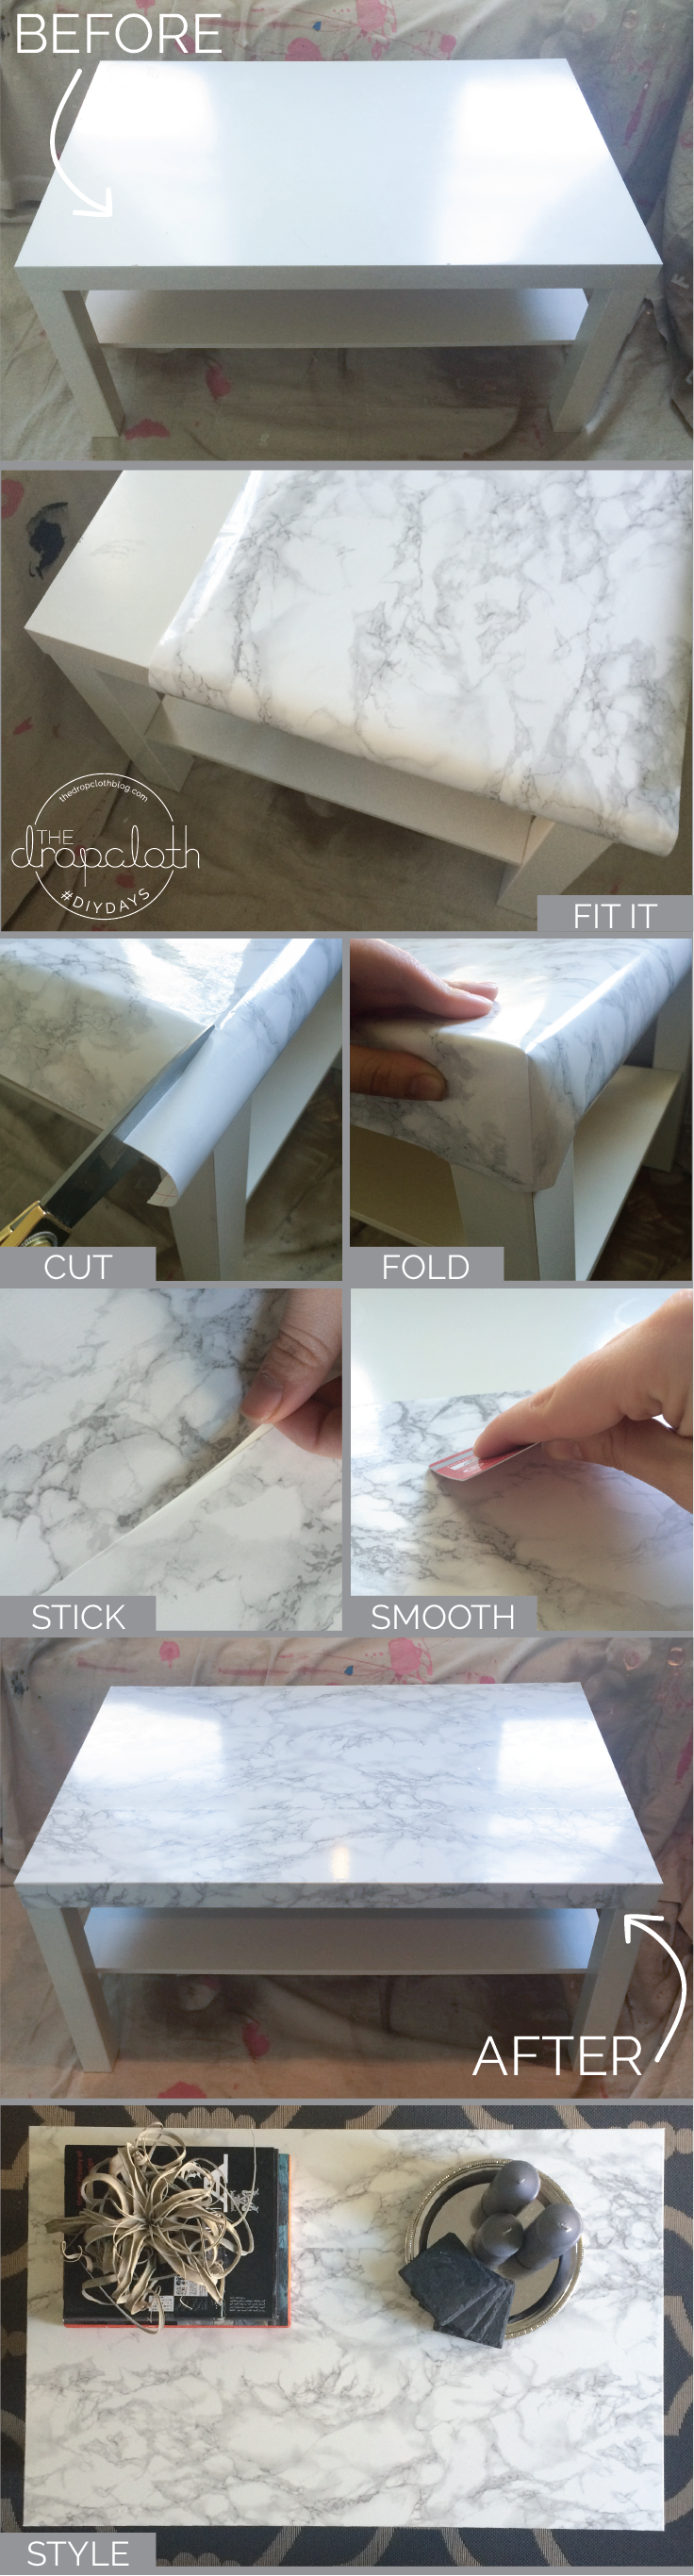 DIY: Ikea-Hack Faux Marbletop Coffeetable